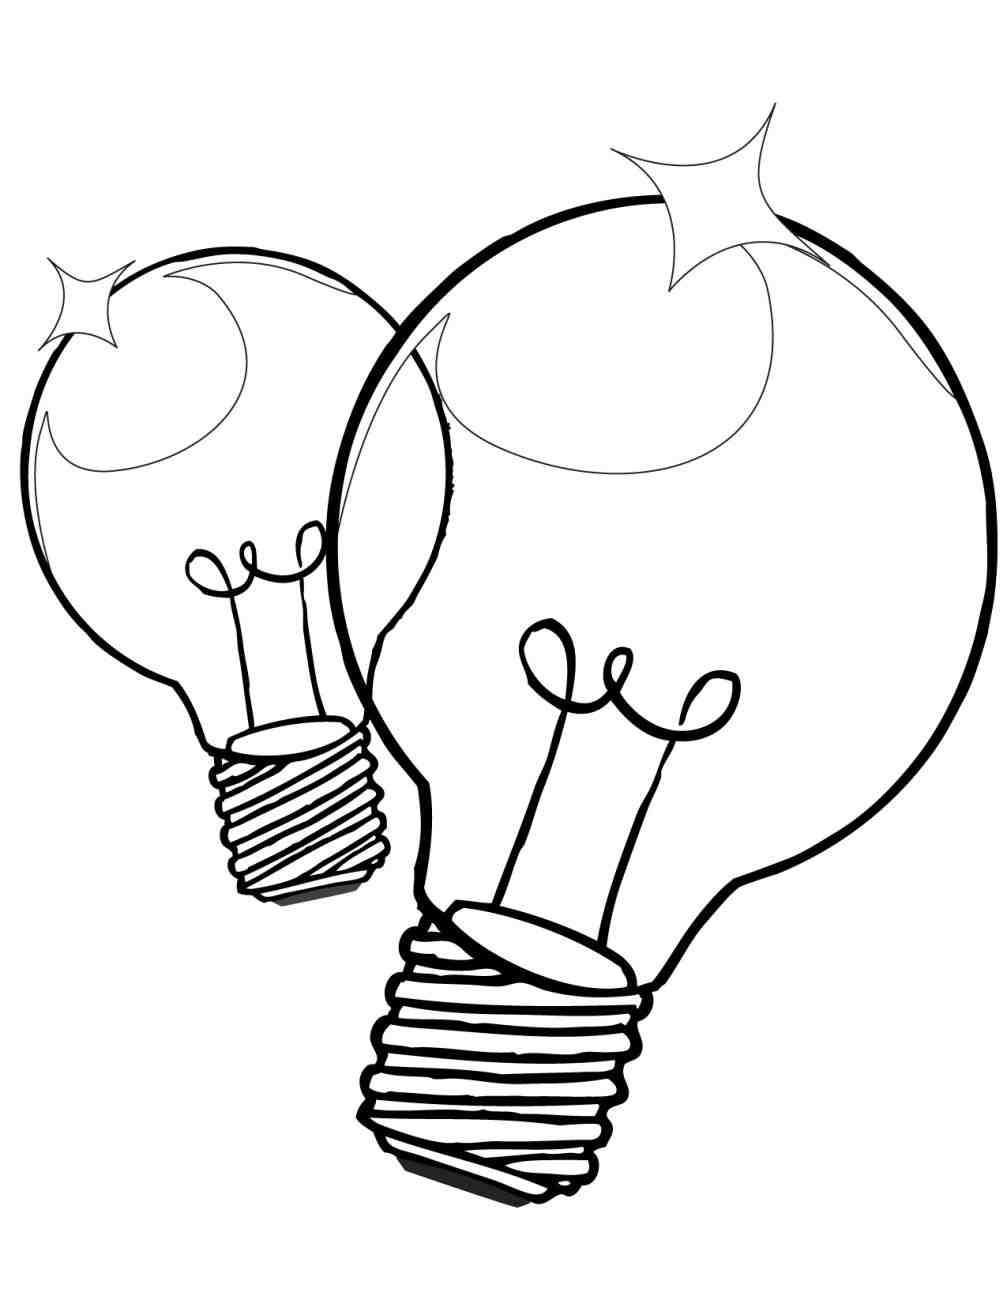 1007x1304 Christmas Light Bulb Clipart Black And White Cheminee.website